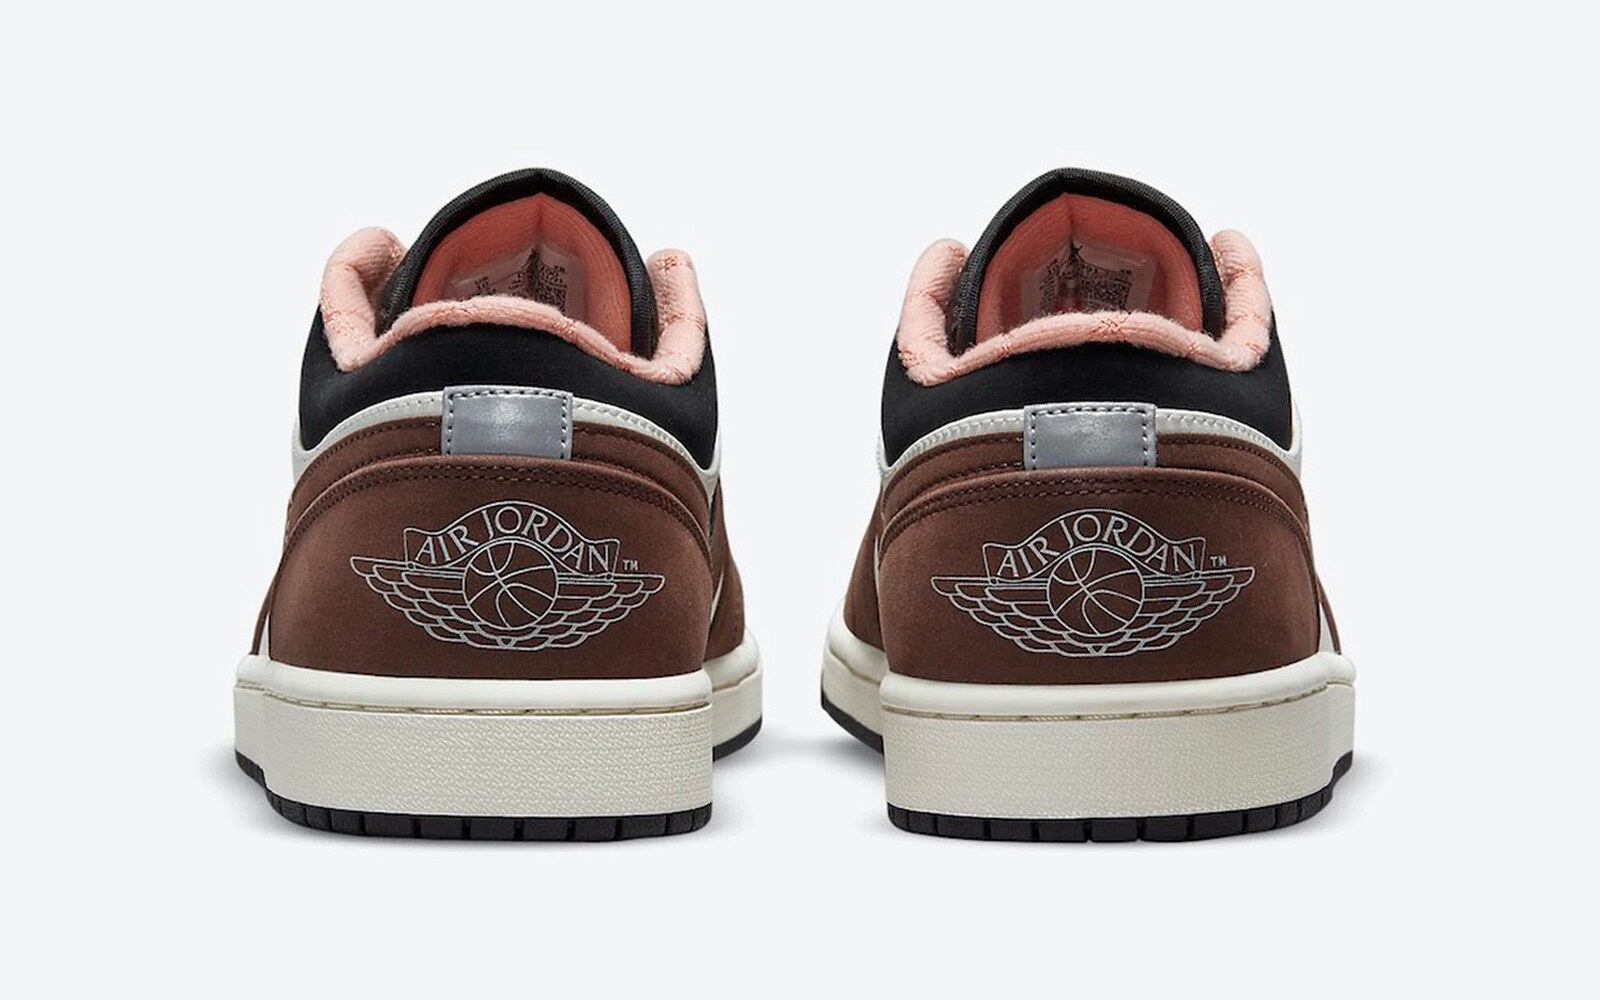 Air Jordan 1 Low Mocha